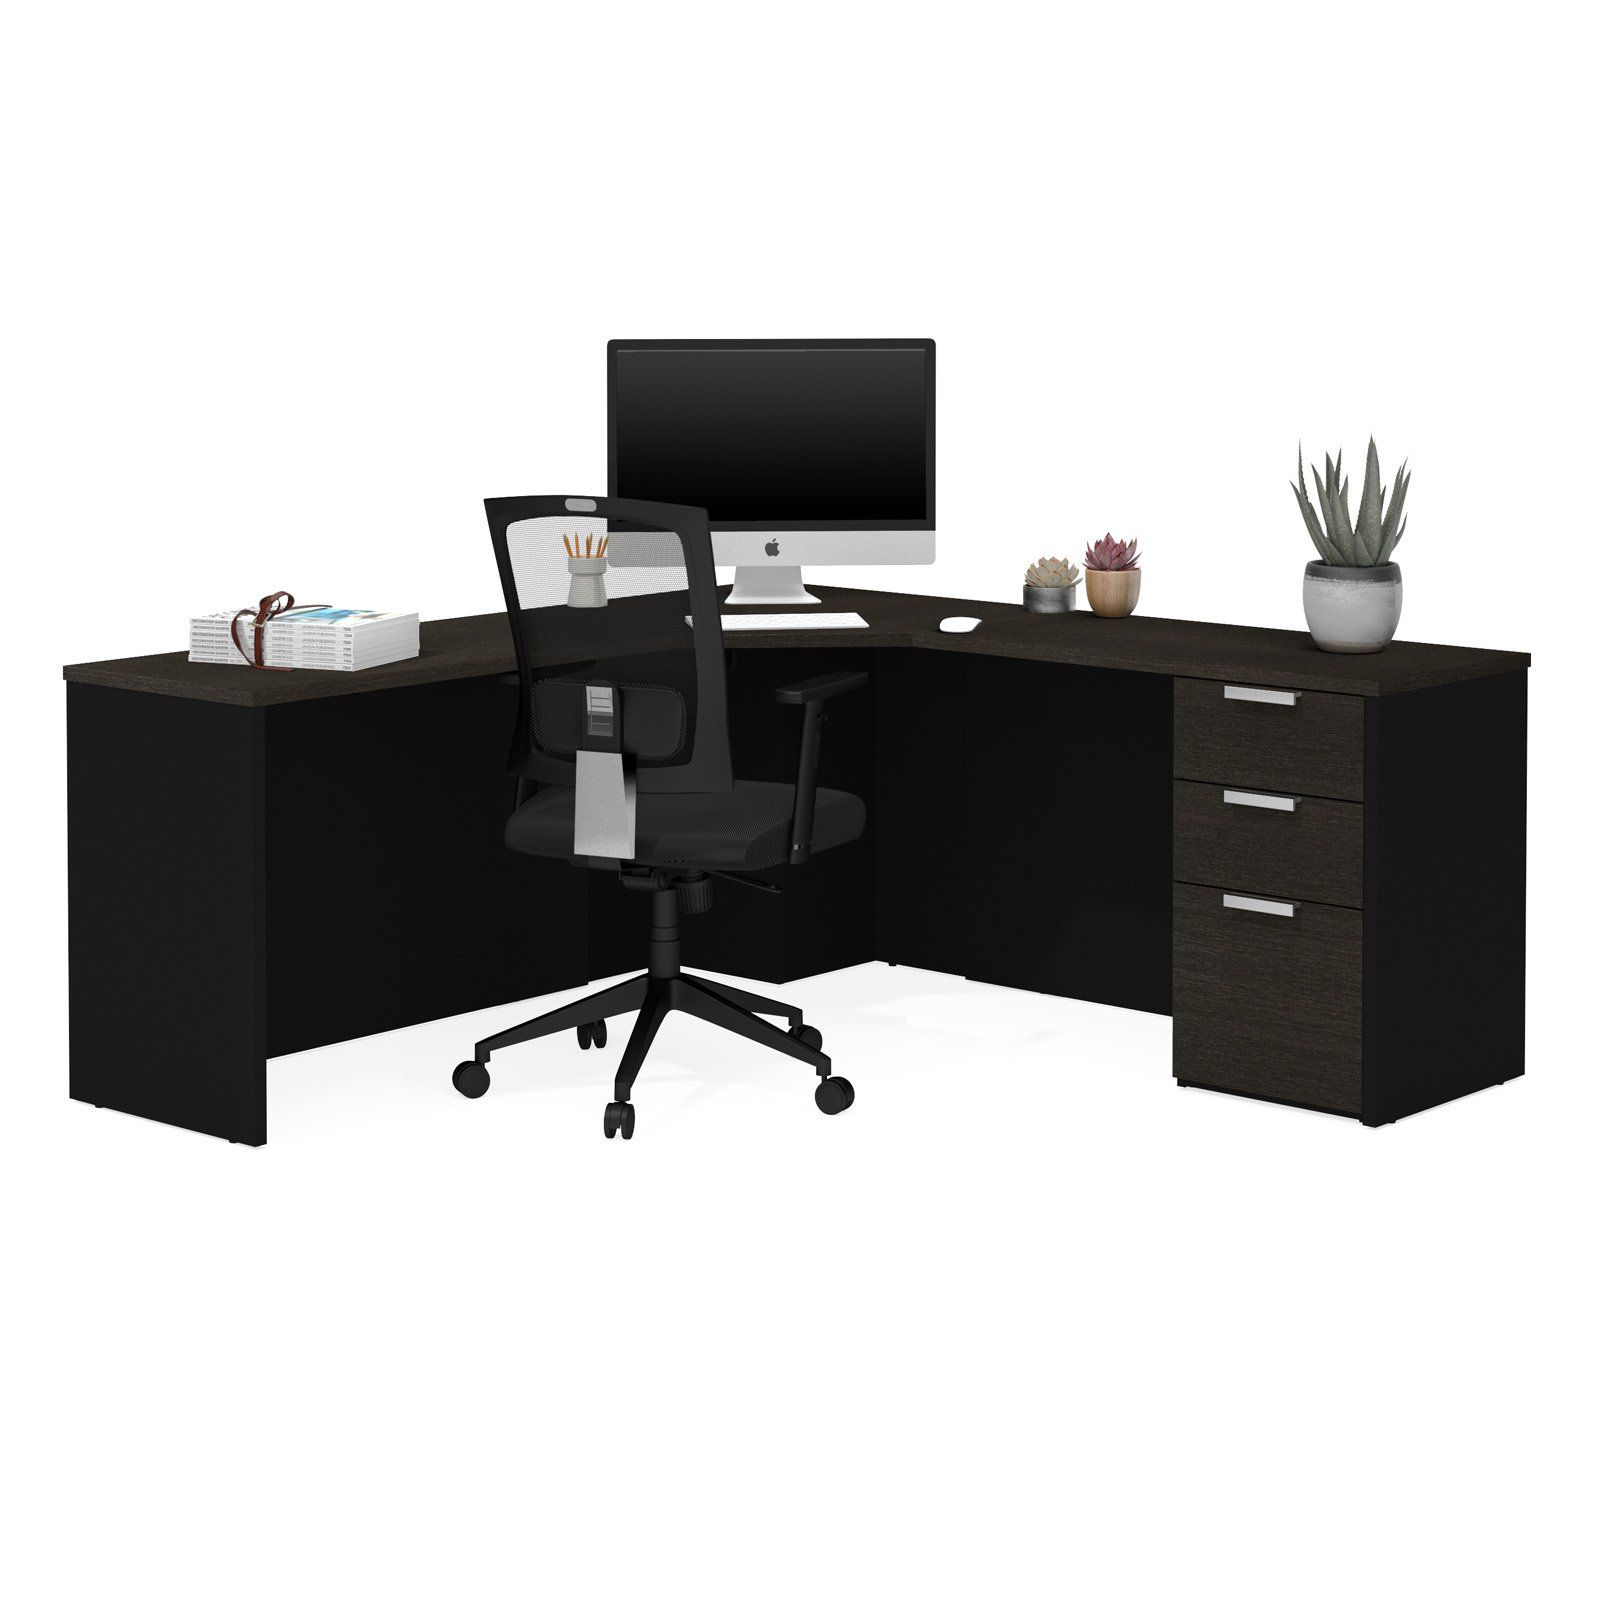 bestar pro concept plus corner desk with optional keyboard shelf rh pinterest com